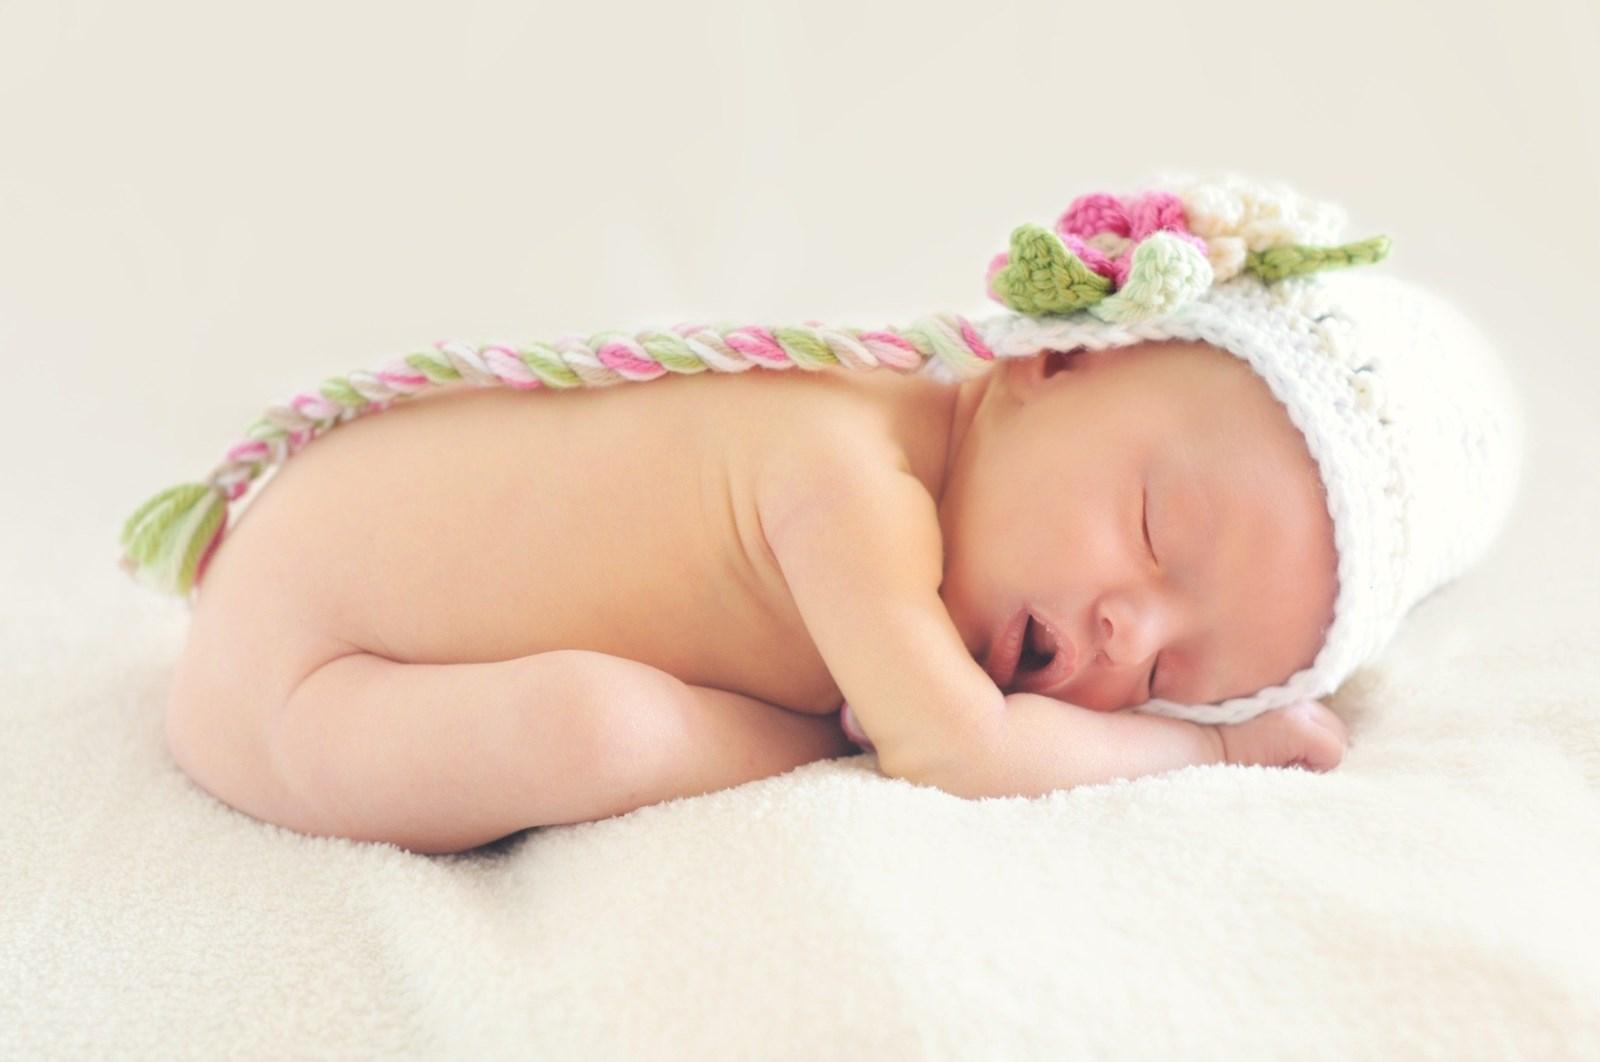 baby-784609_1920.jpg